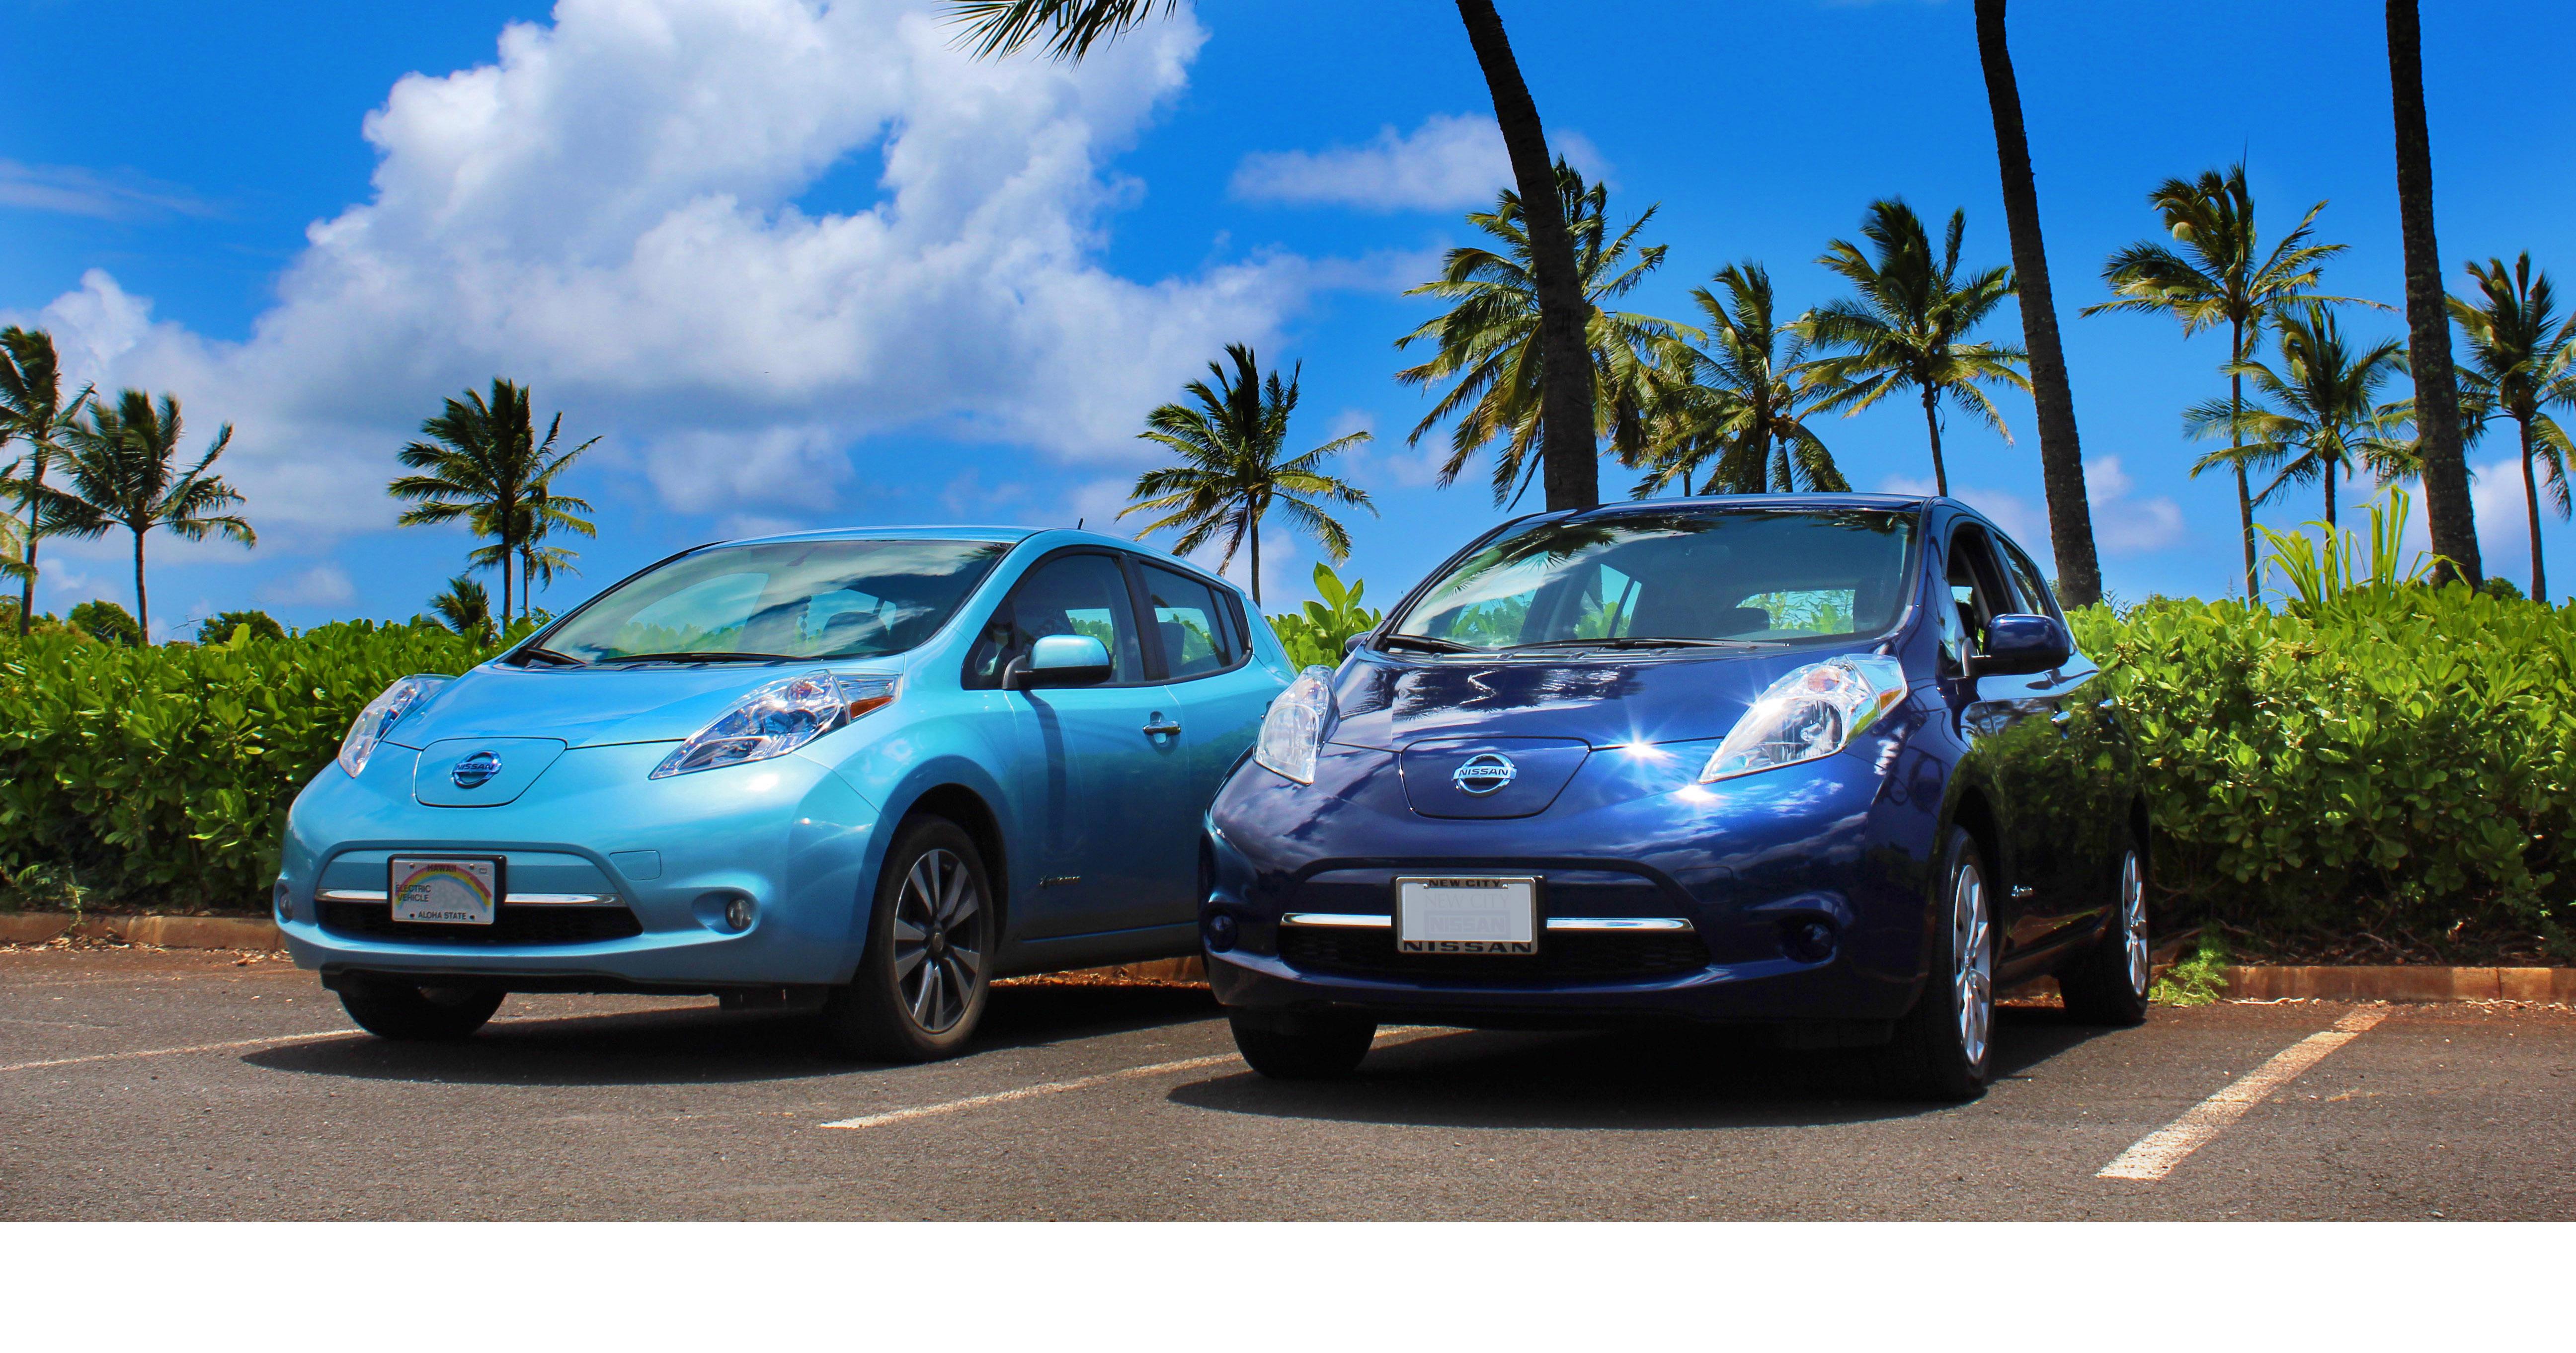 $10,000 rebate on Nissan Leaf extended to June 30